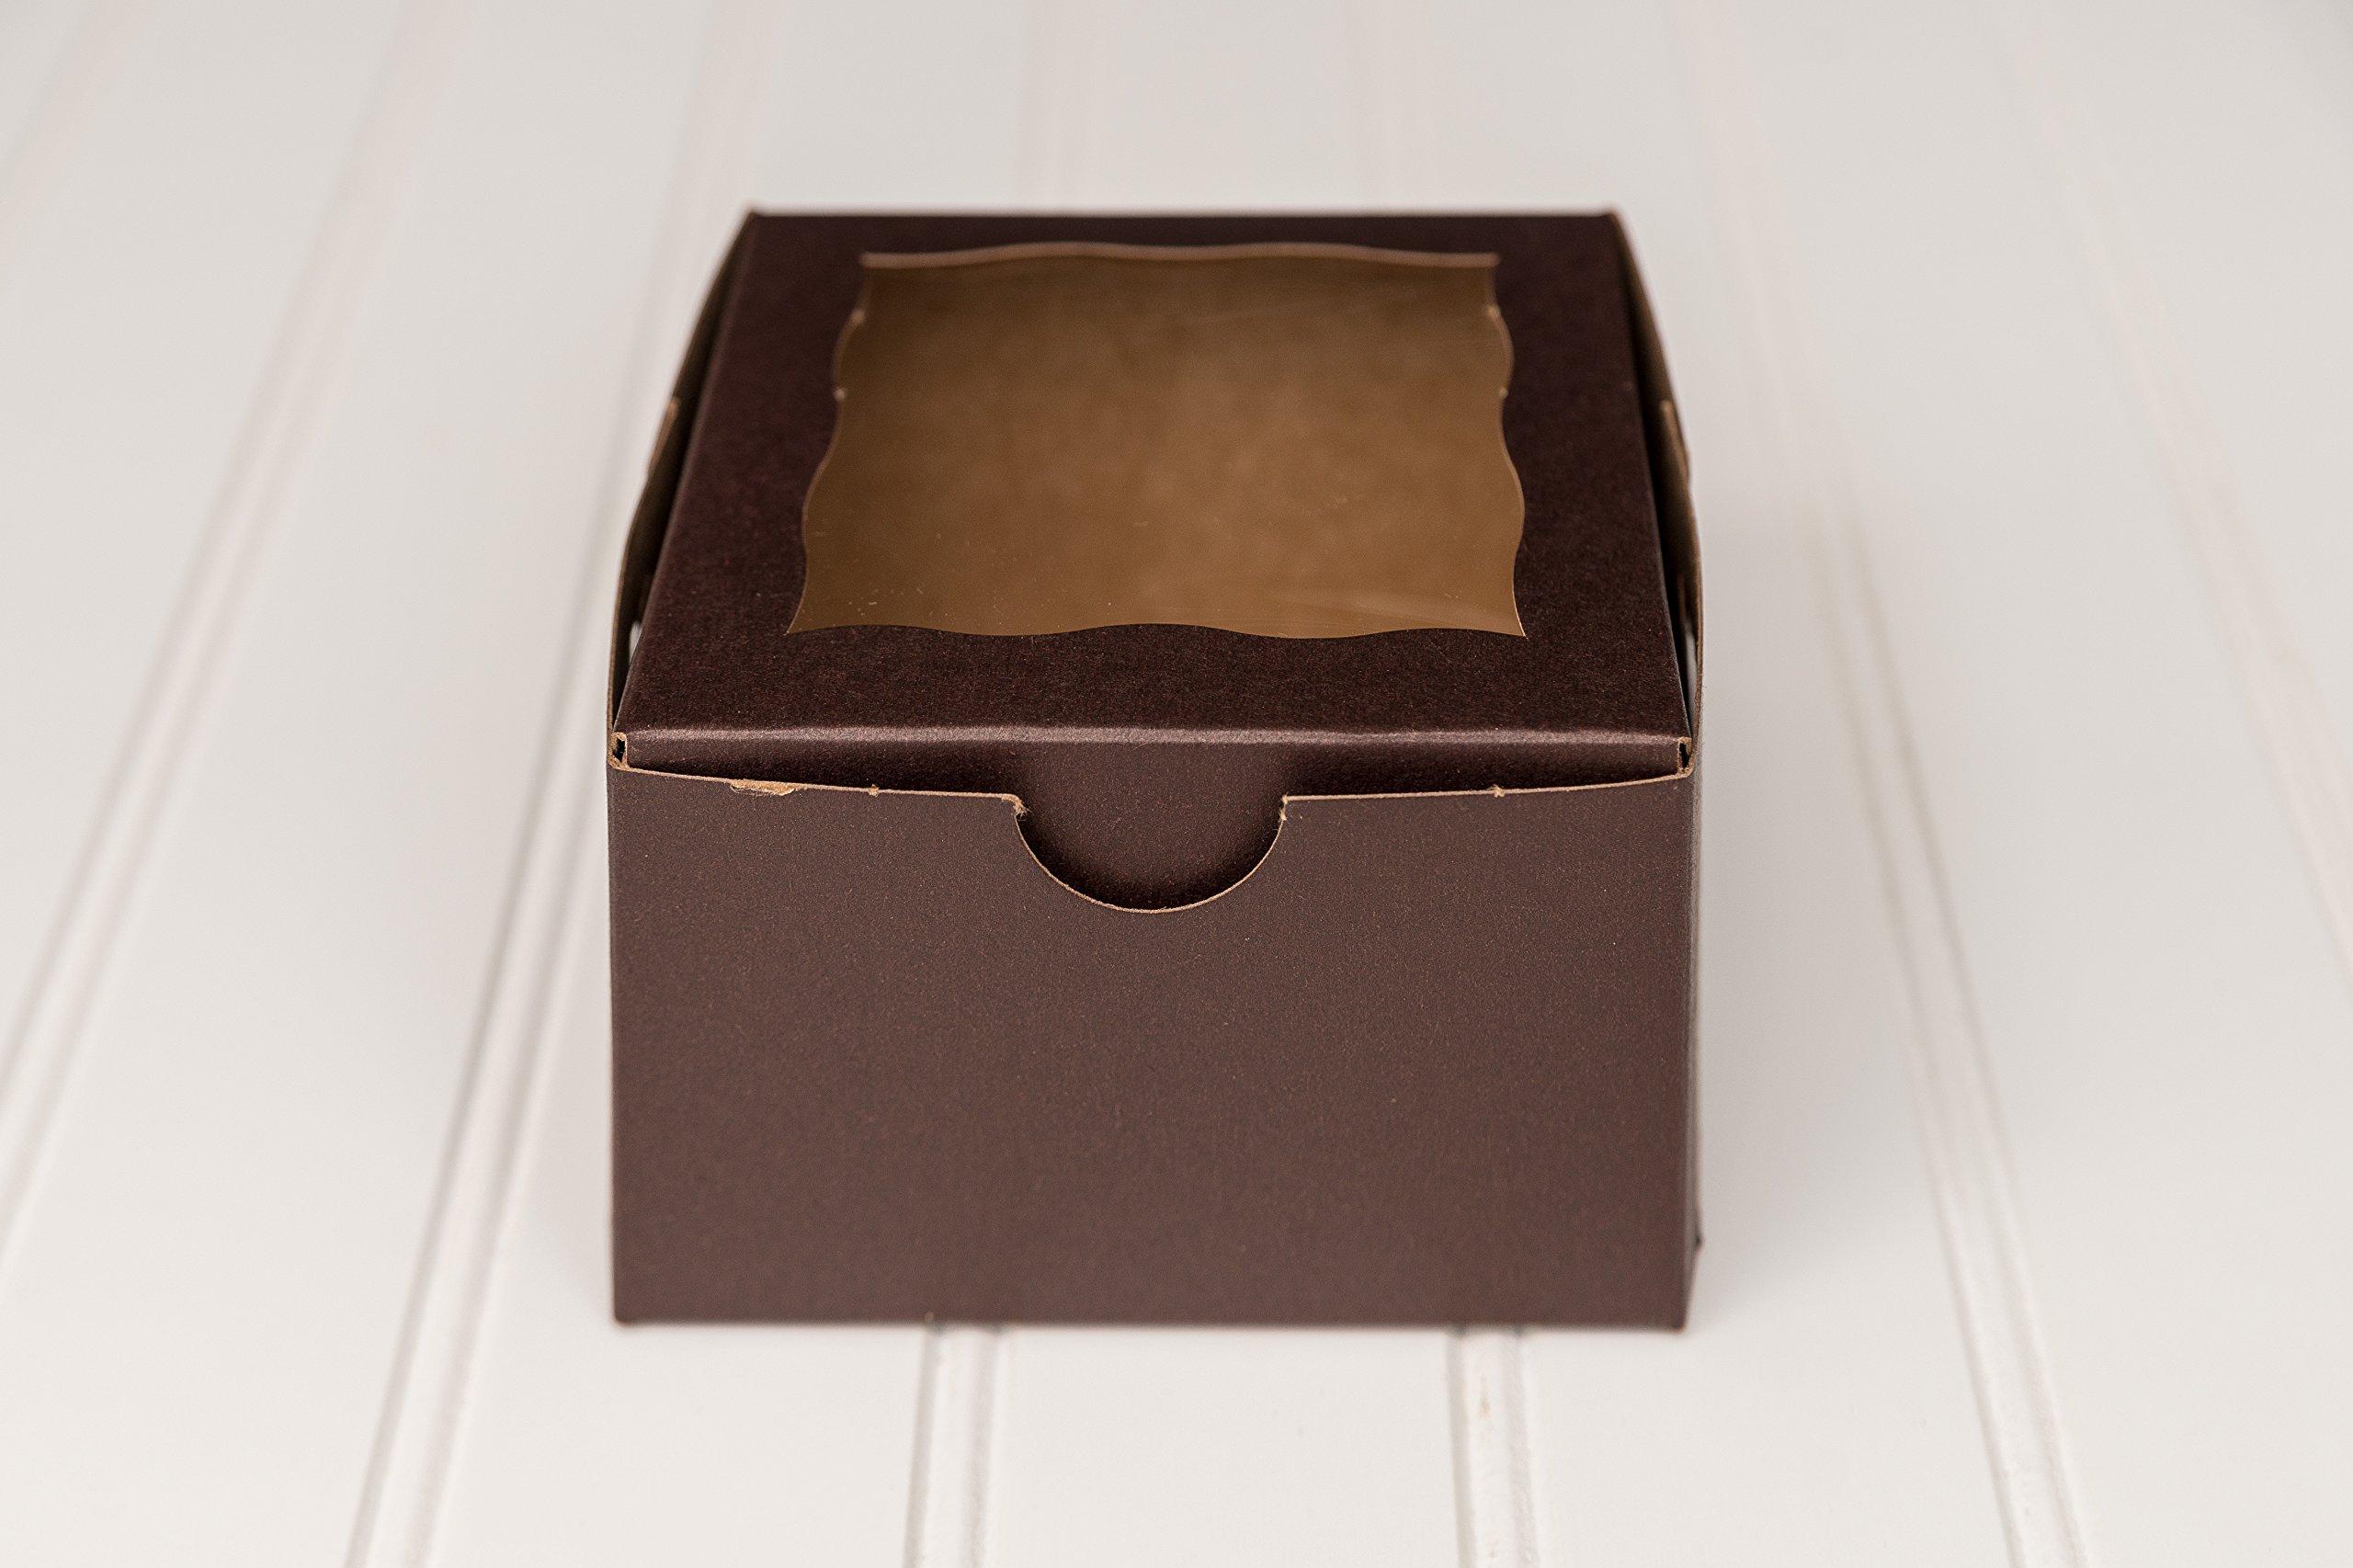 12 Chocolate Brown Single Donut Box 4 x 4 x 2 1/2